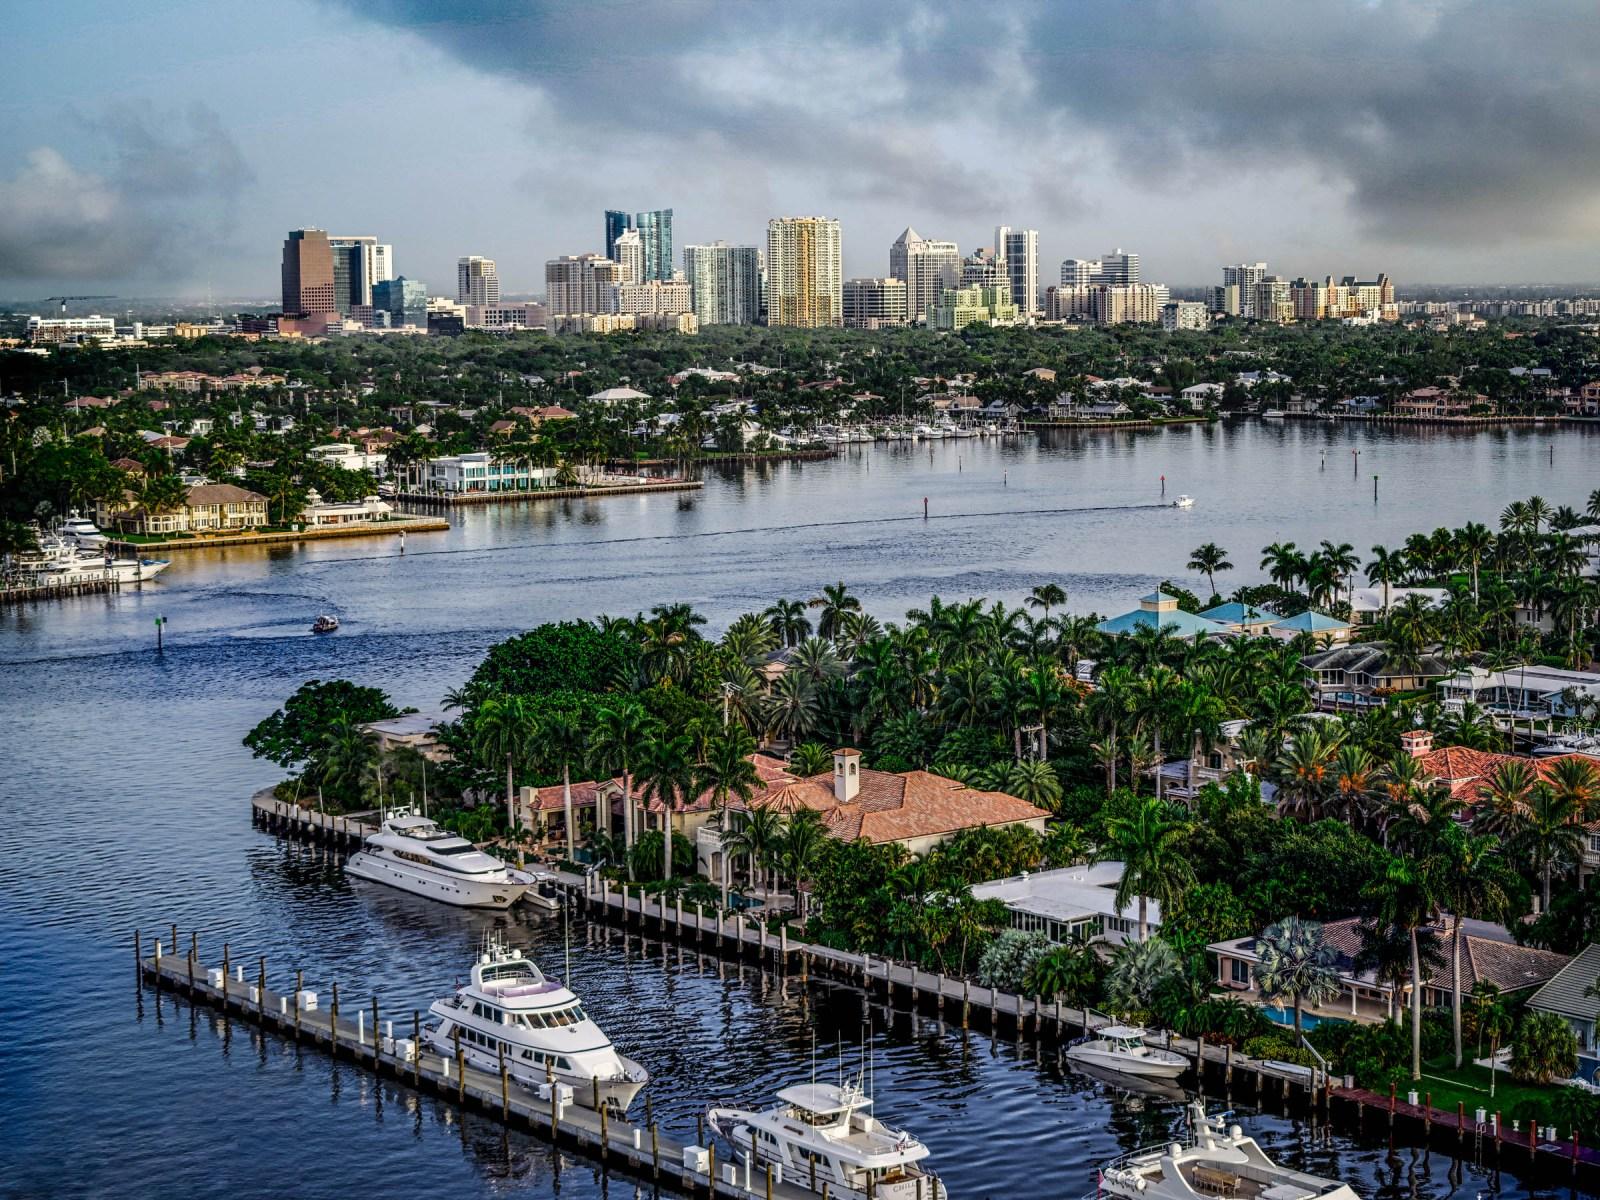 Downtown Ft Lauderdale